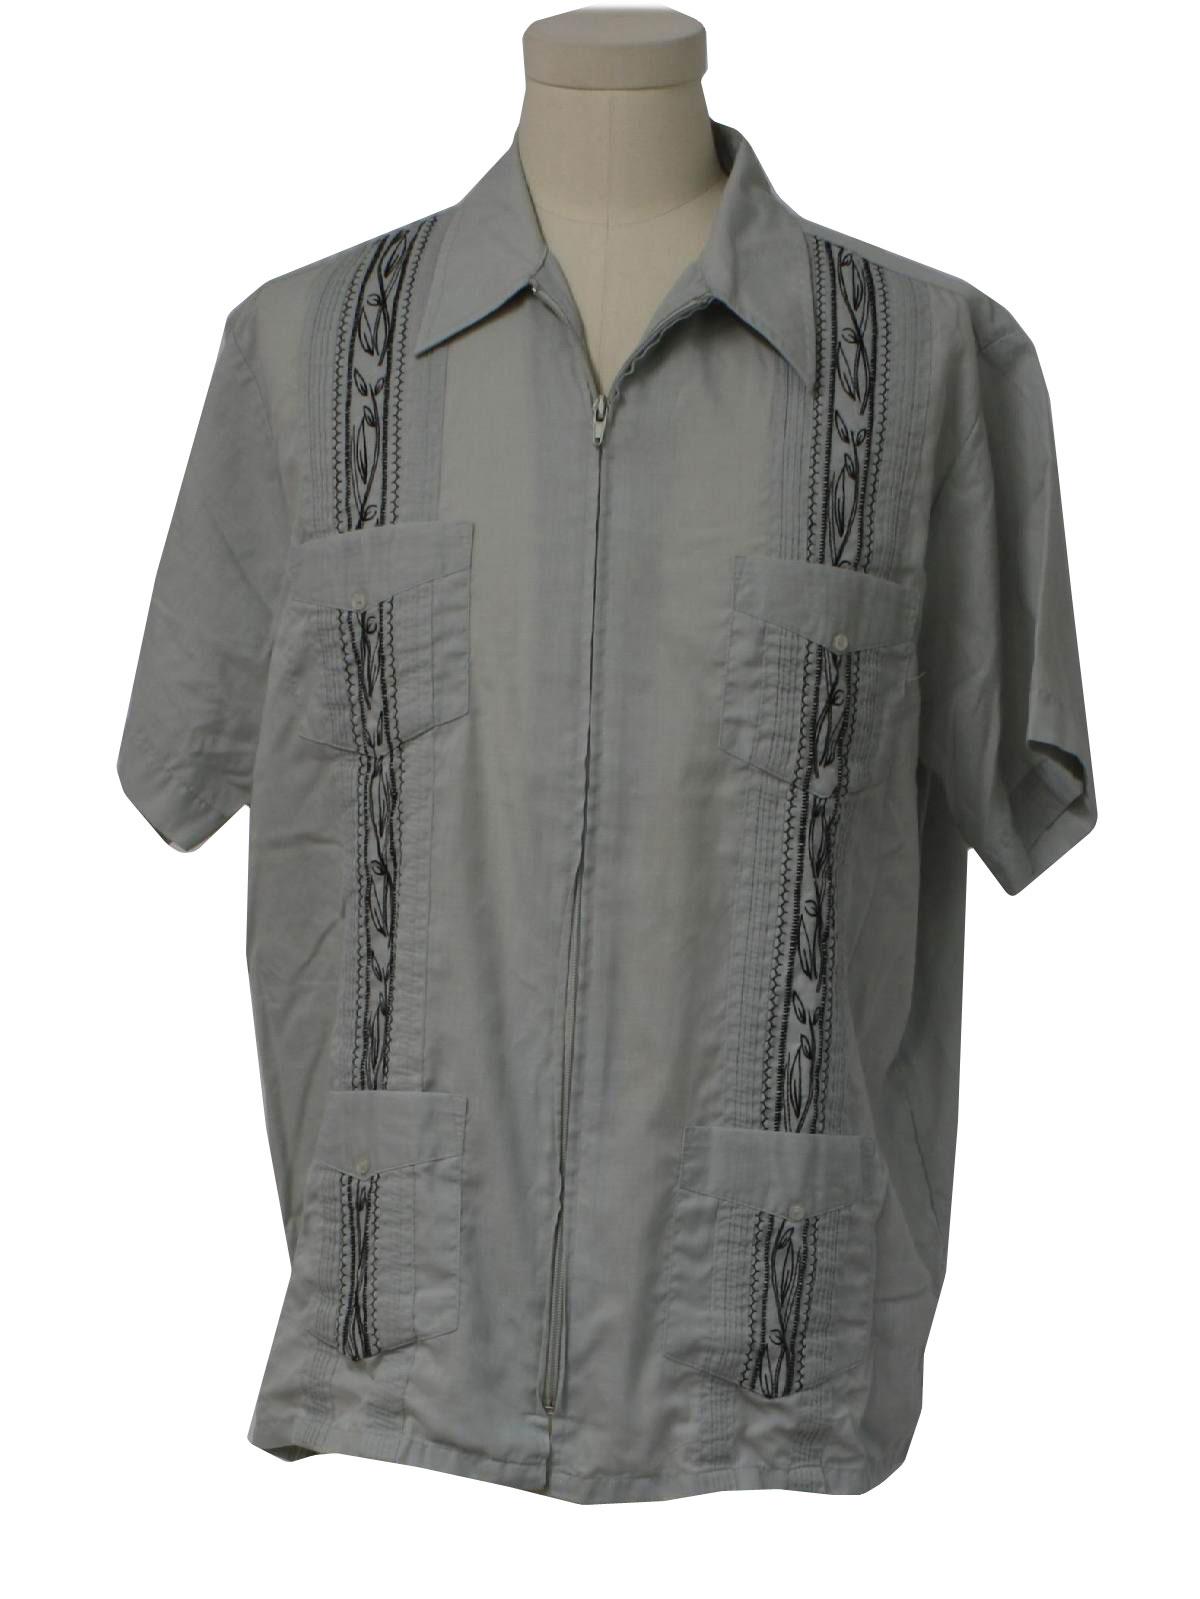 1980s vintage haband guayabera shirt 80s haband mens